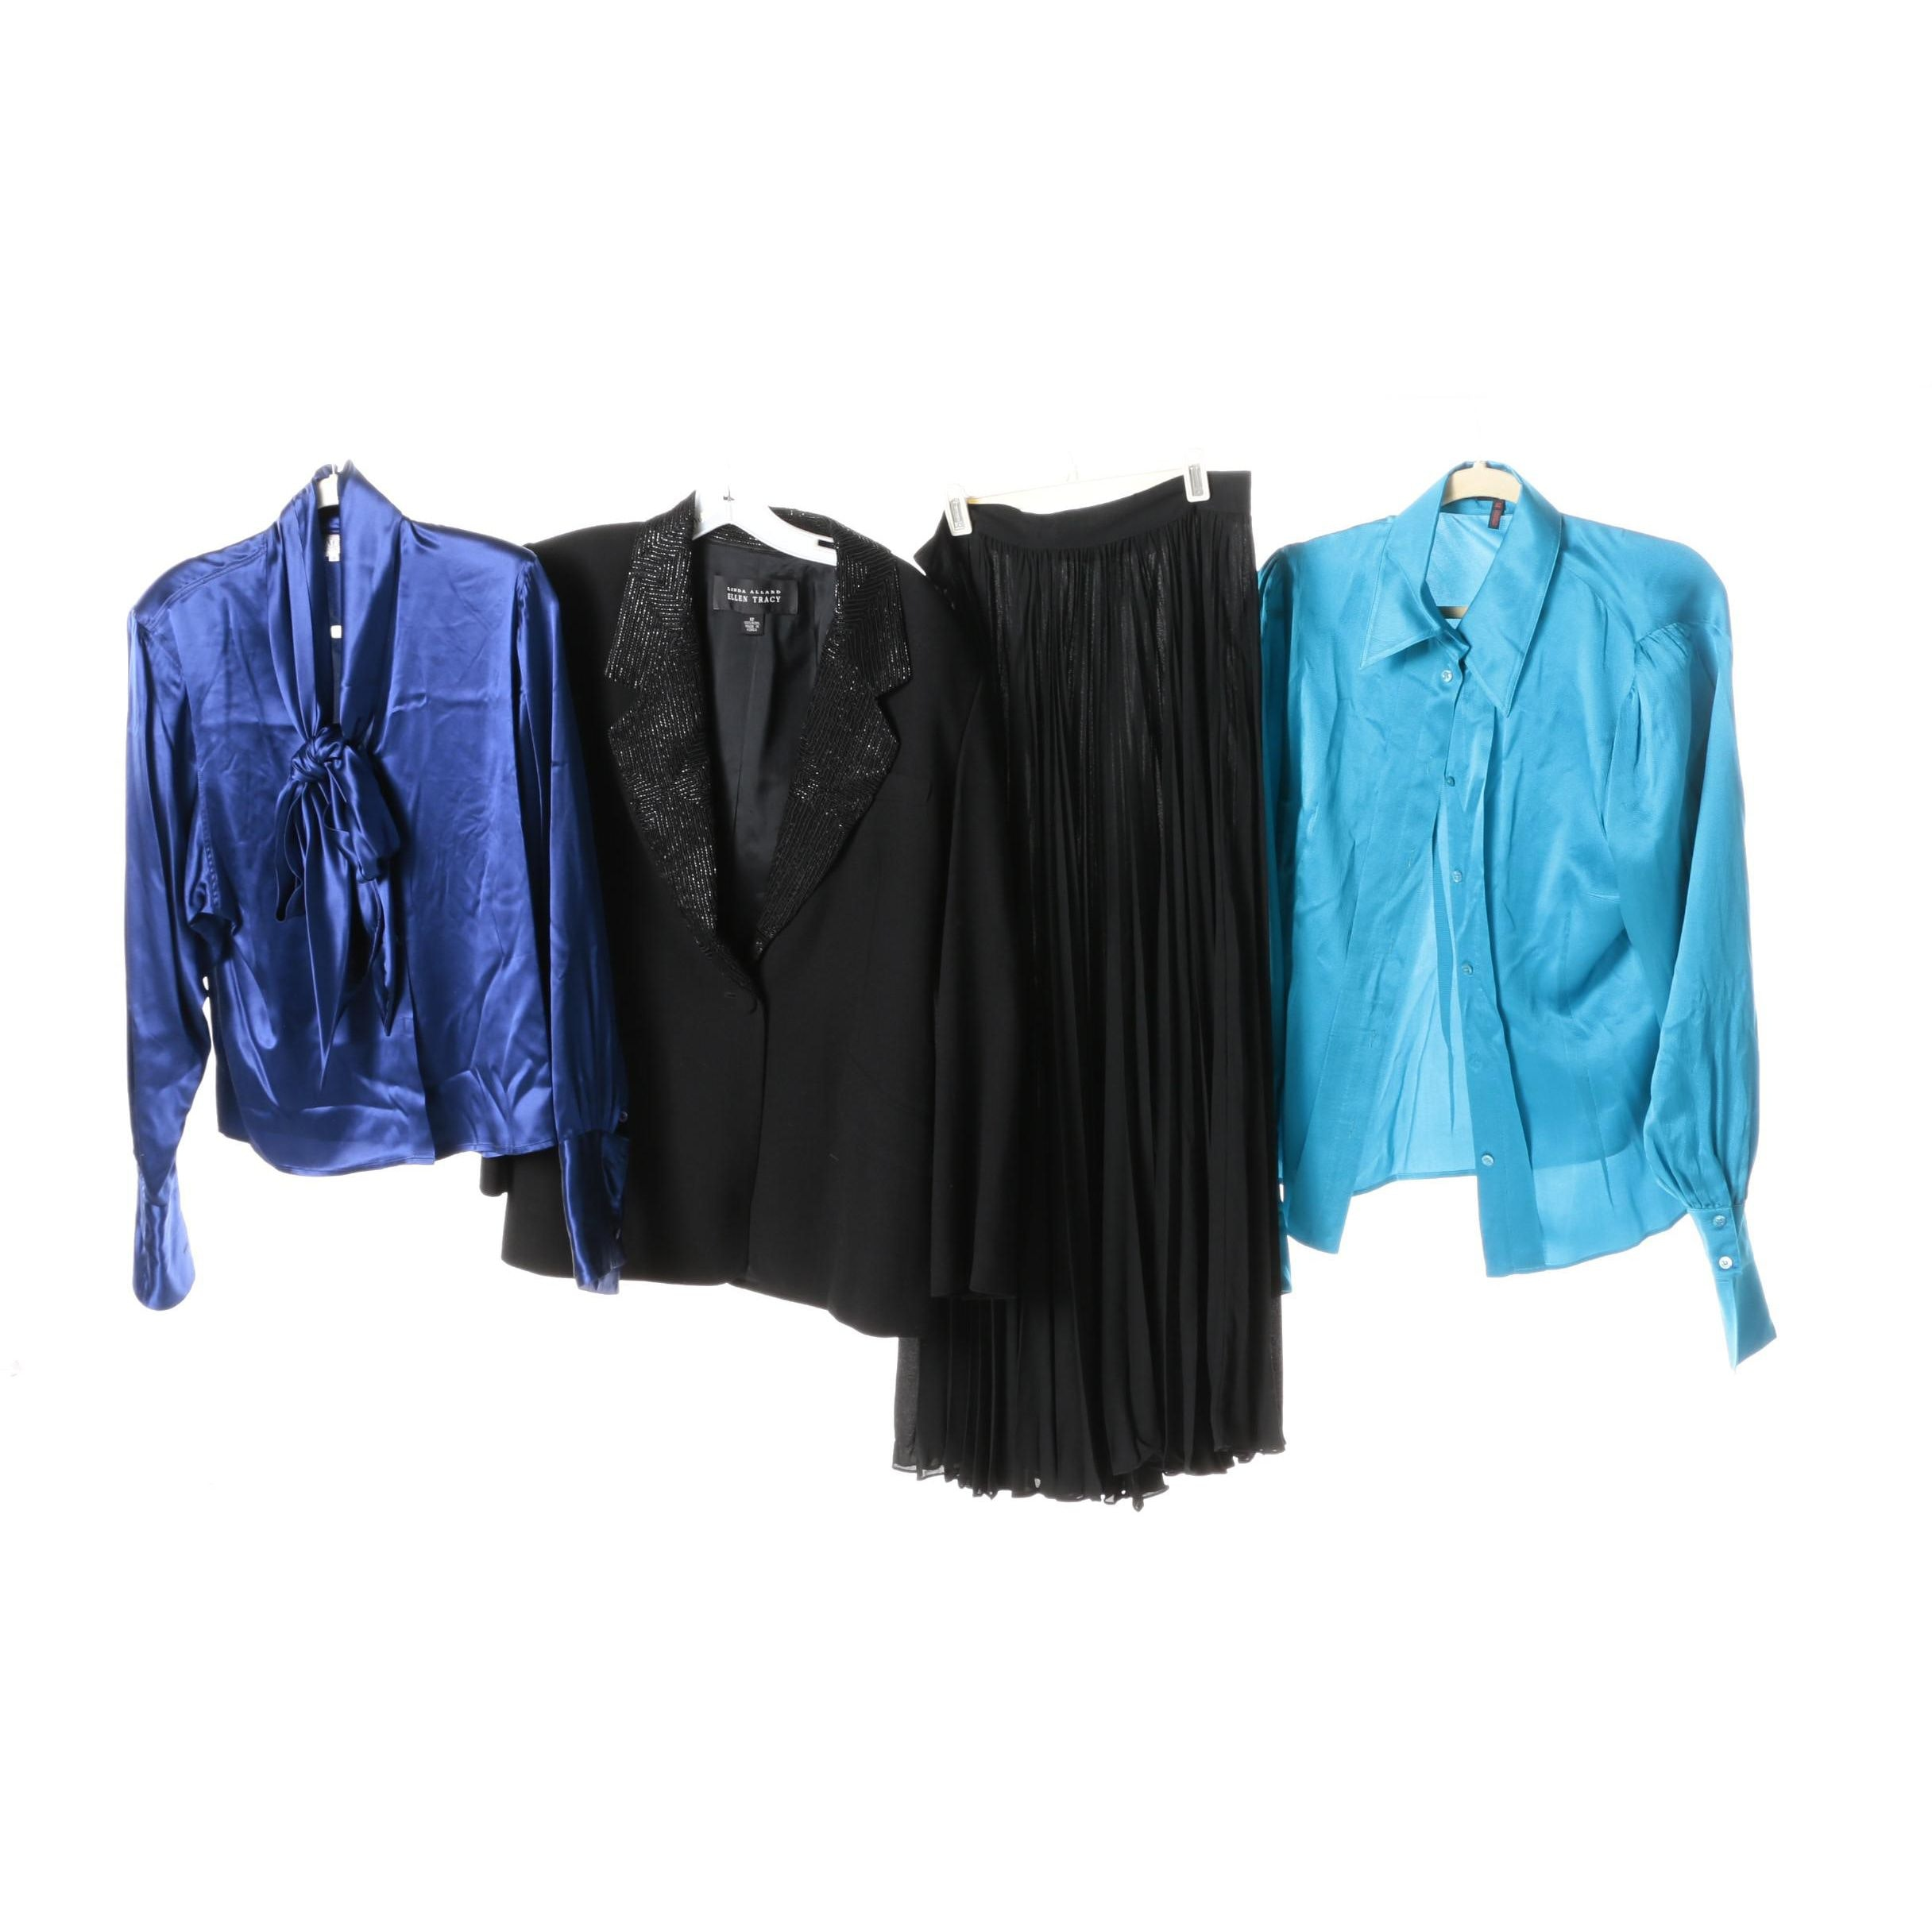 Women's Blouses, Blazer and Skirt Including Escada